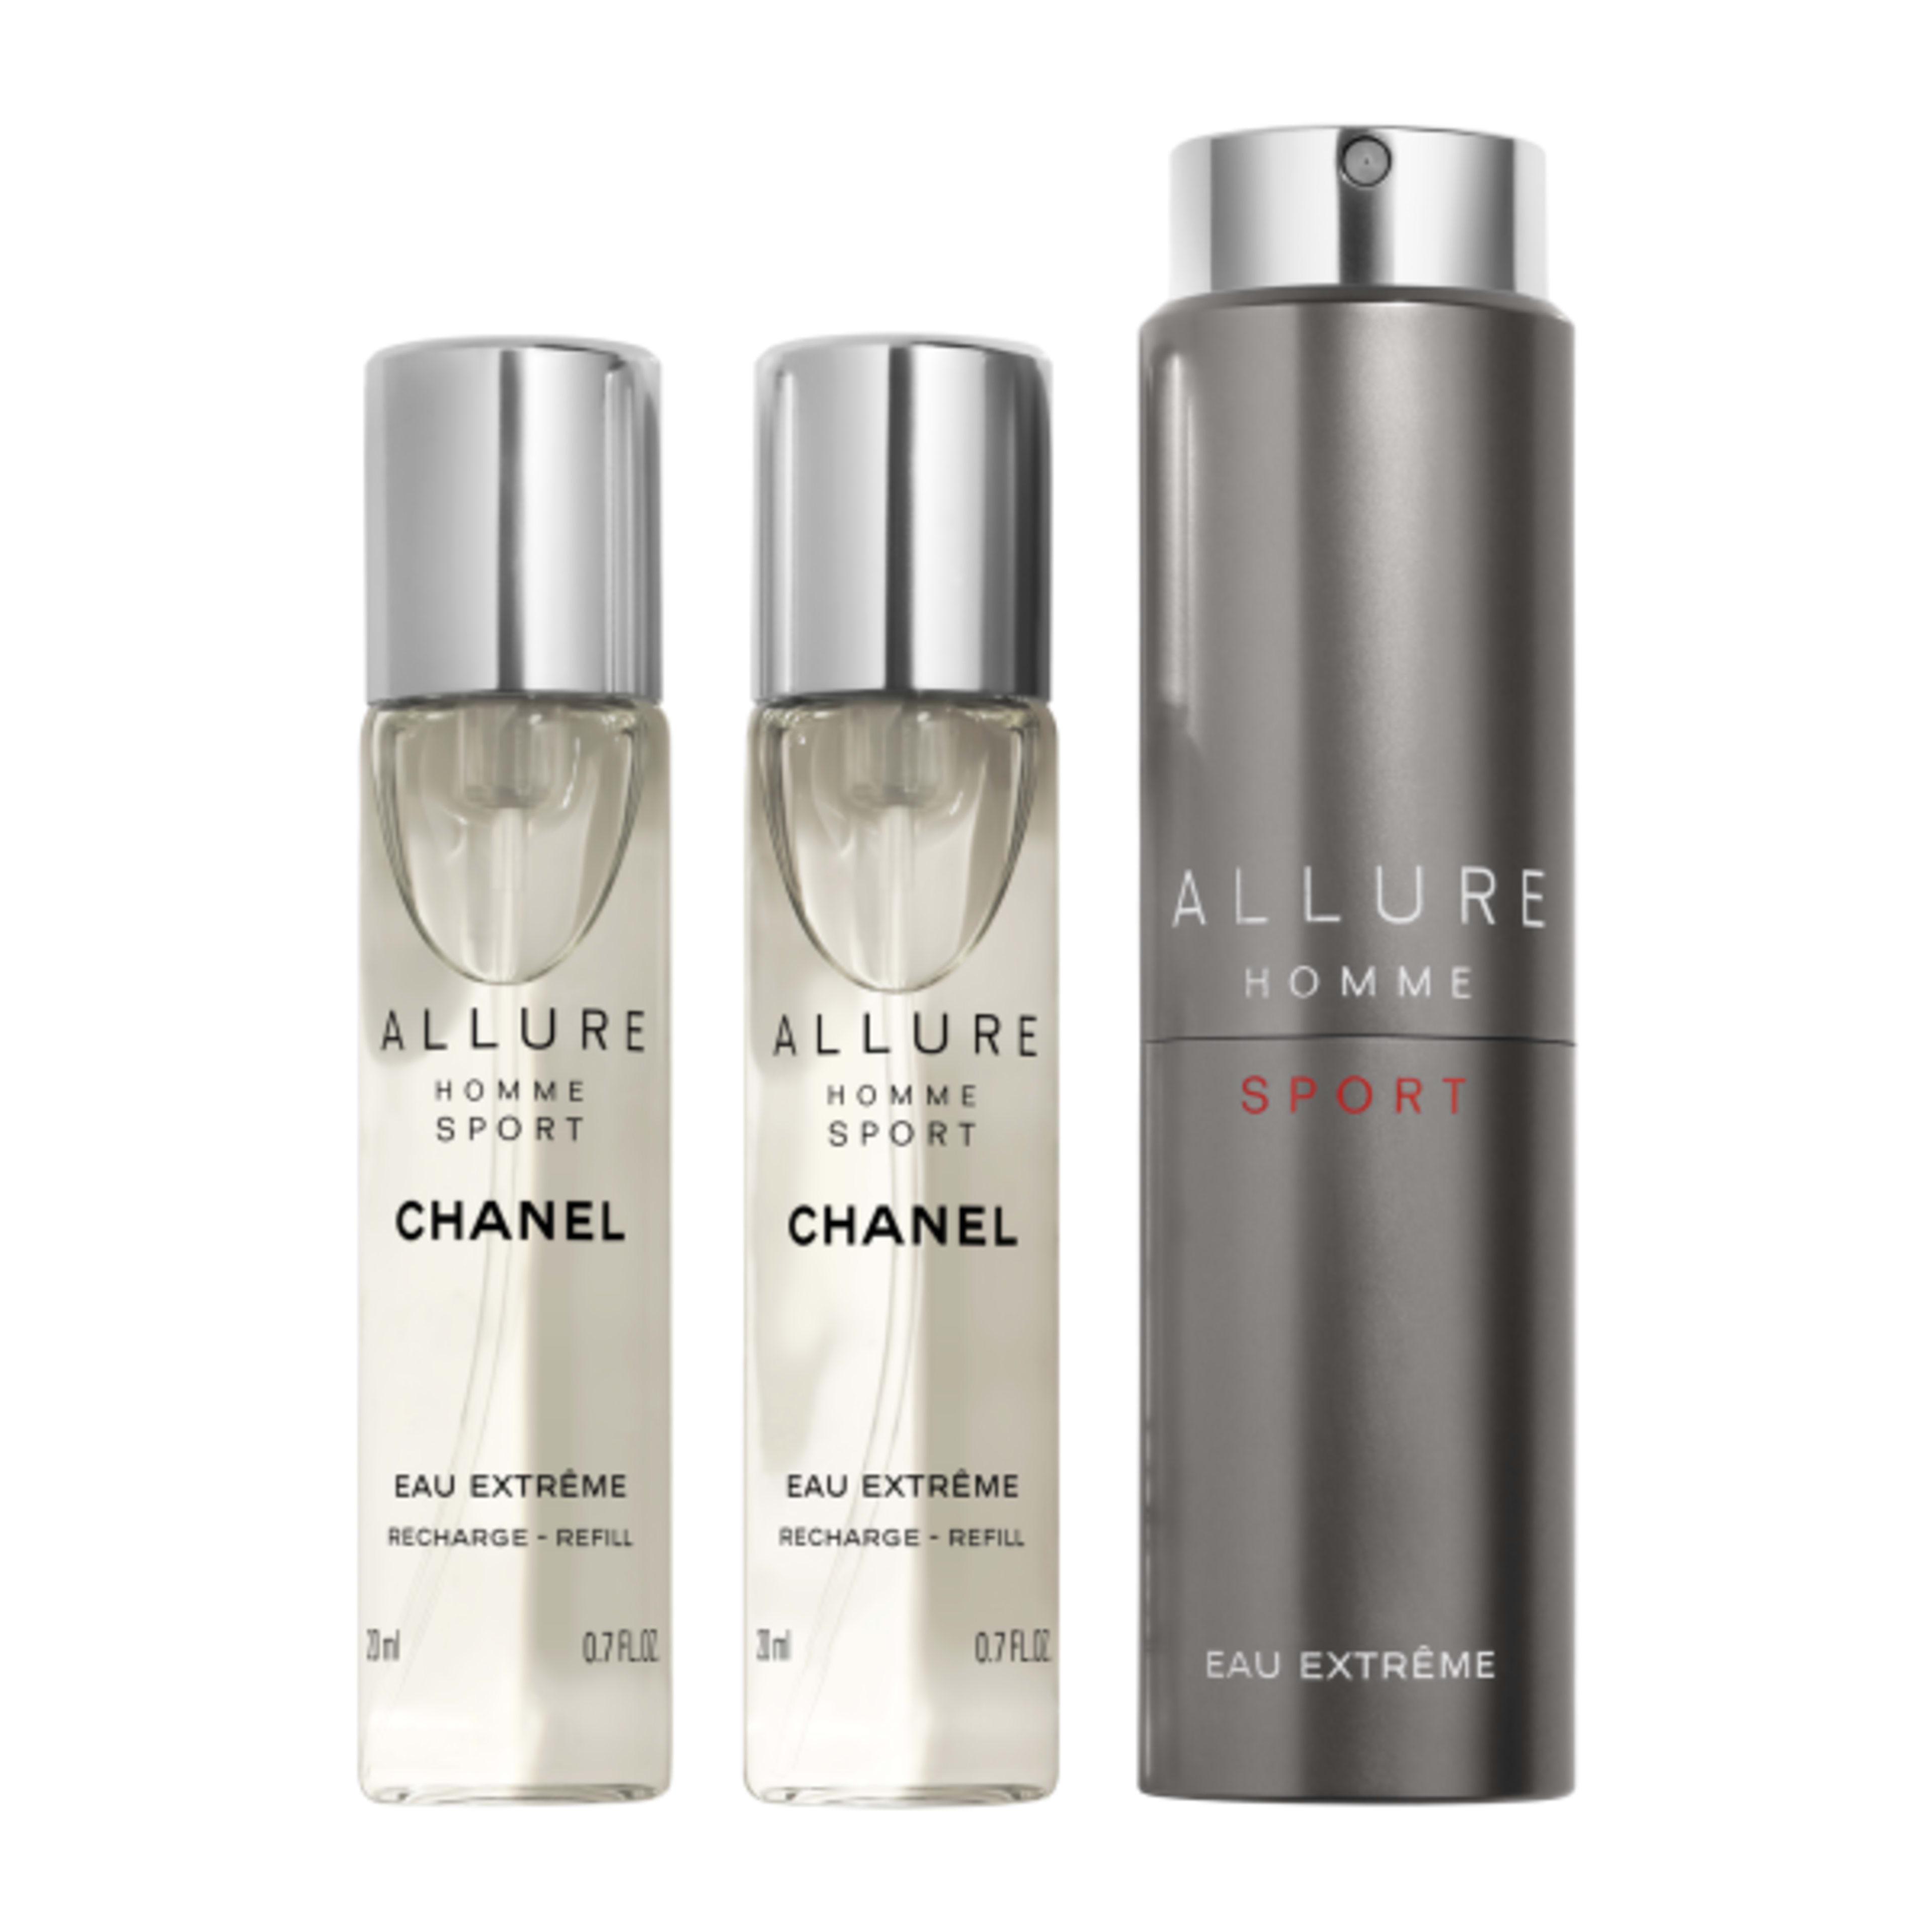 Chanel homme sport eau extreme